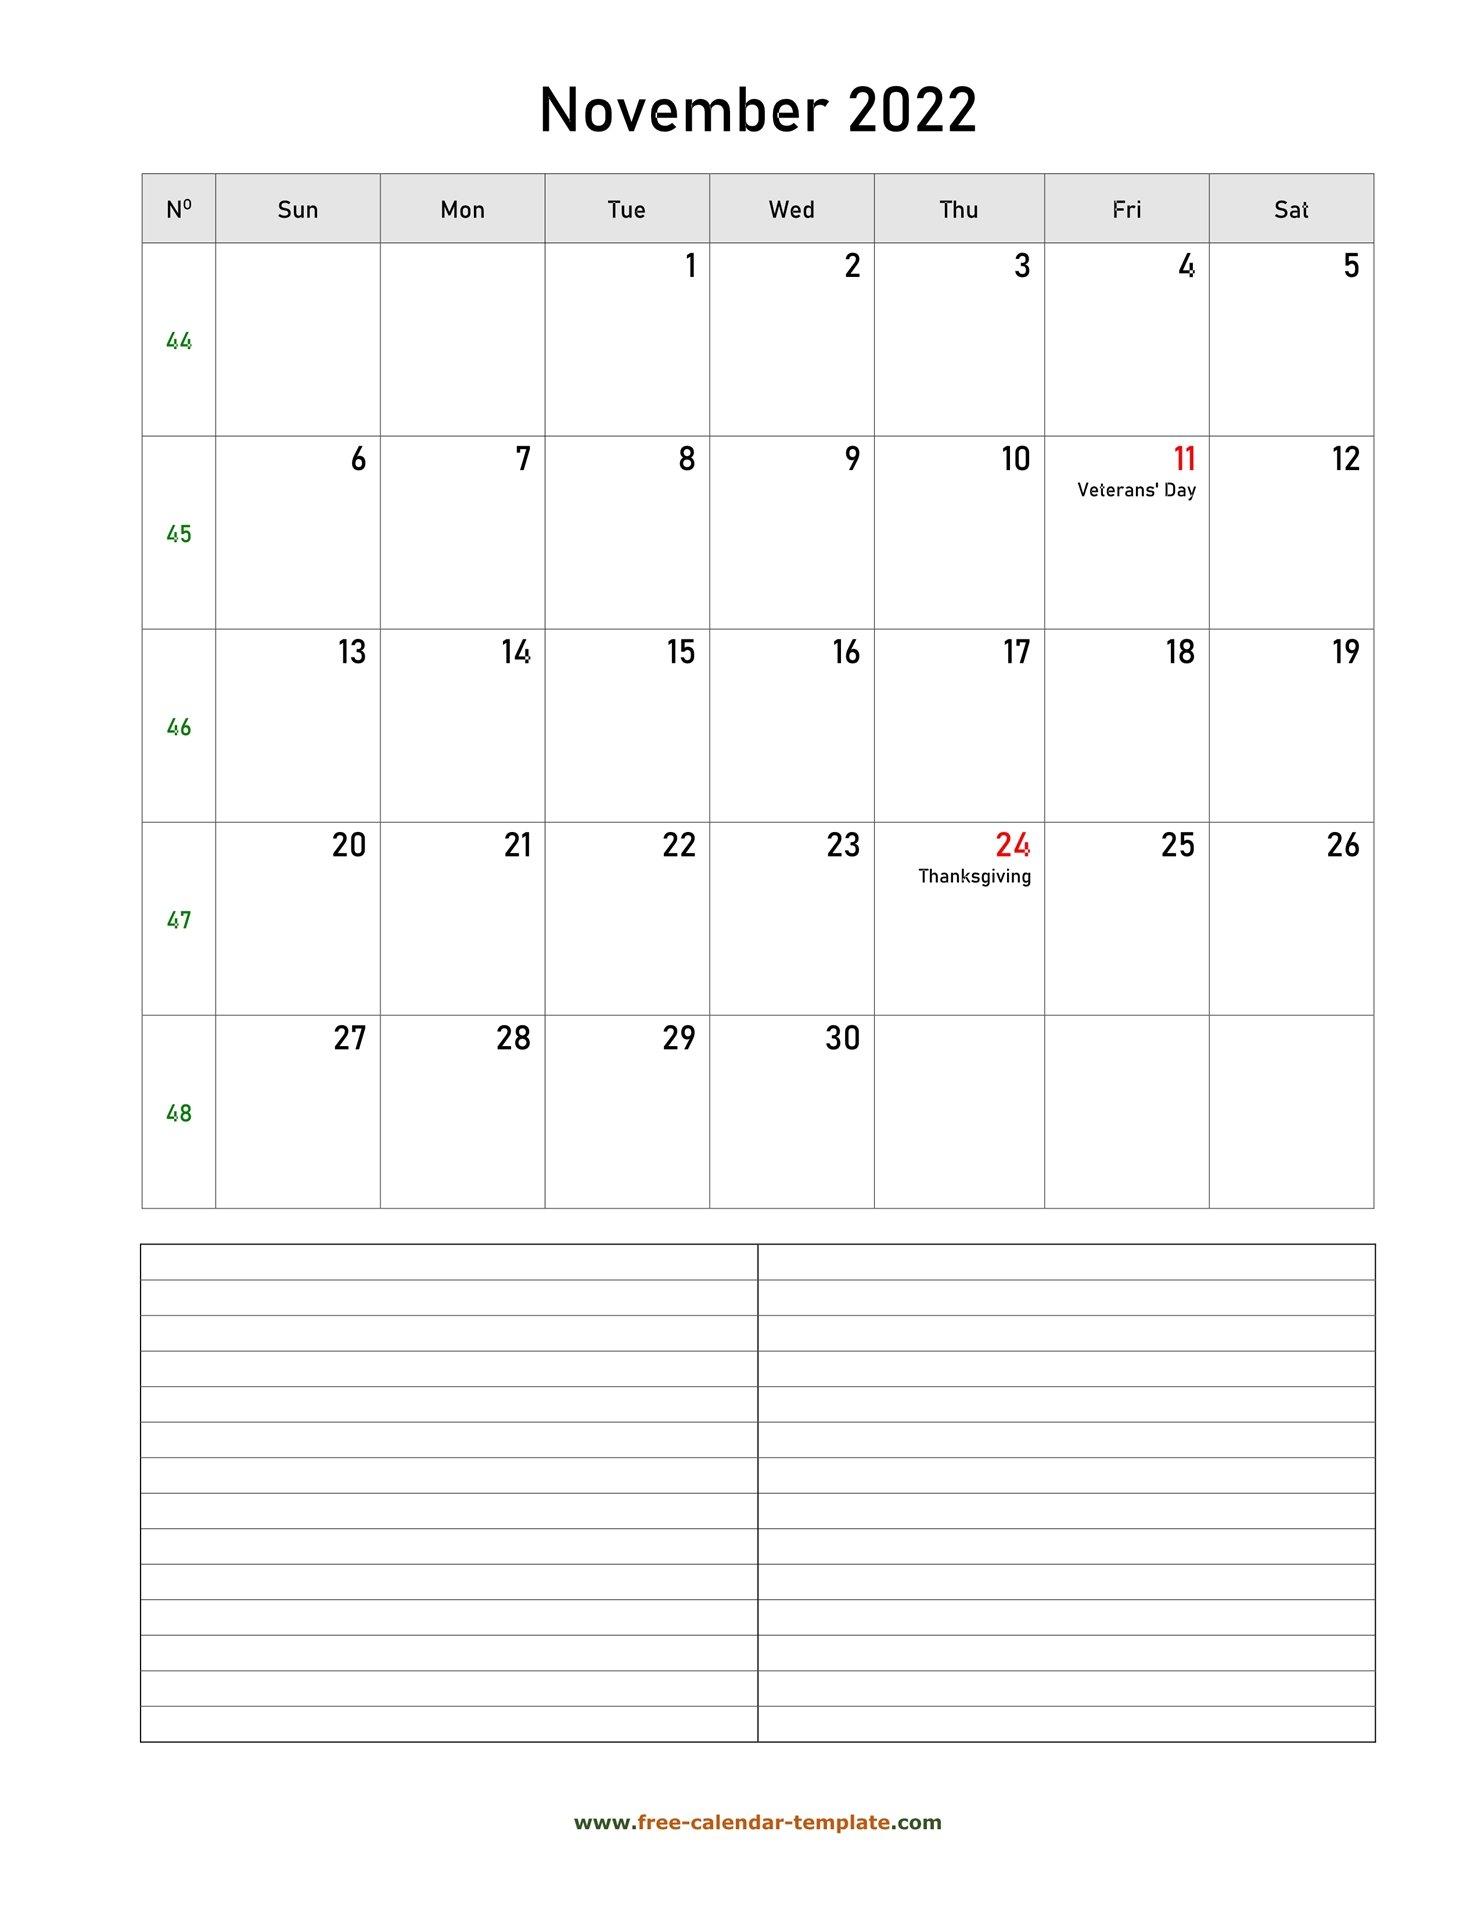 Printable November 2022 Calendar With Space For regarding November 2022 Calendar Planner Printable Photo